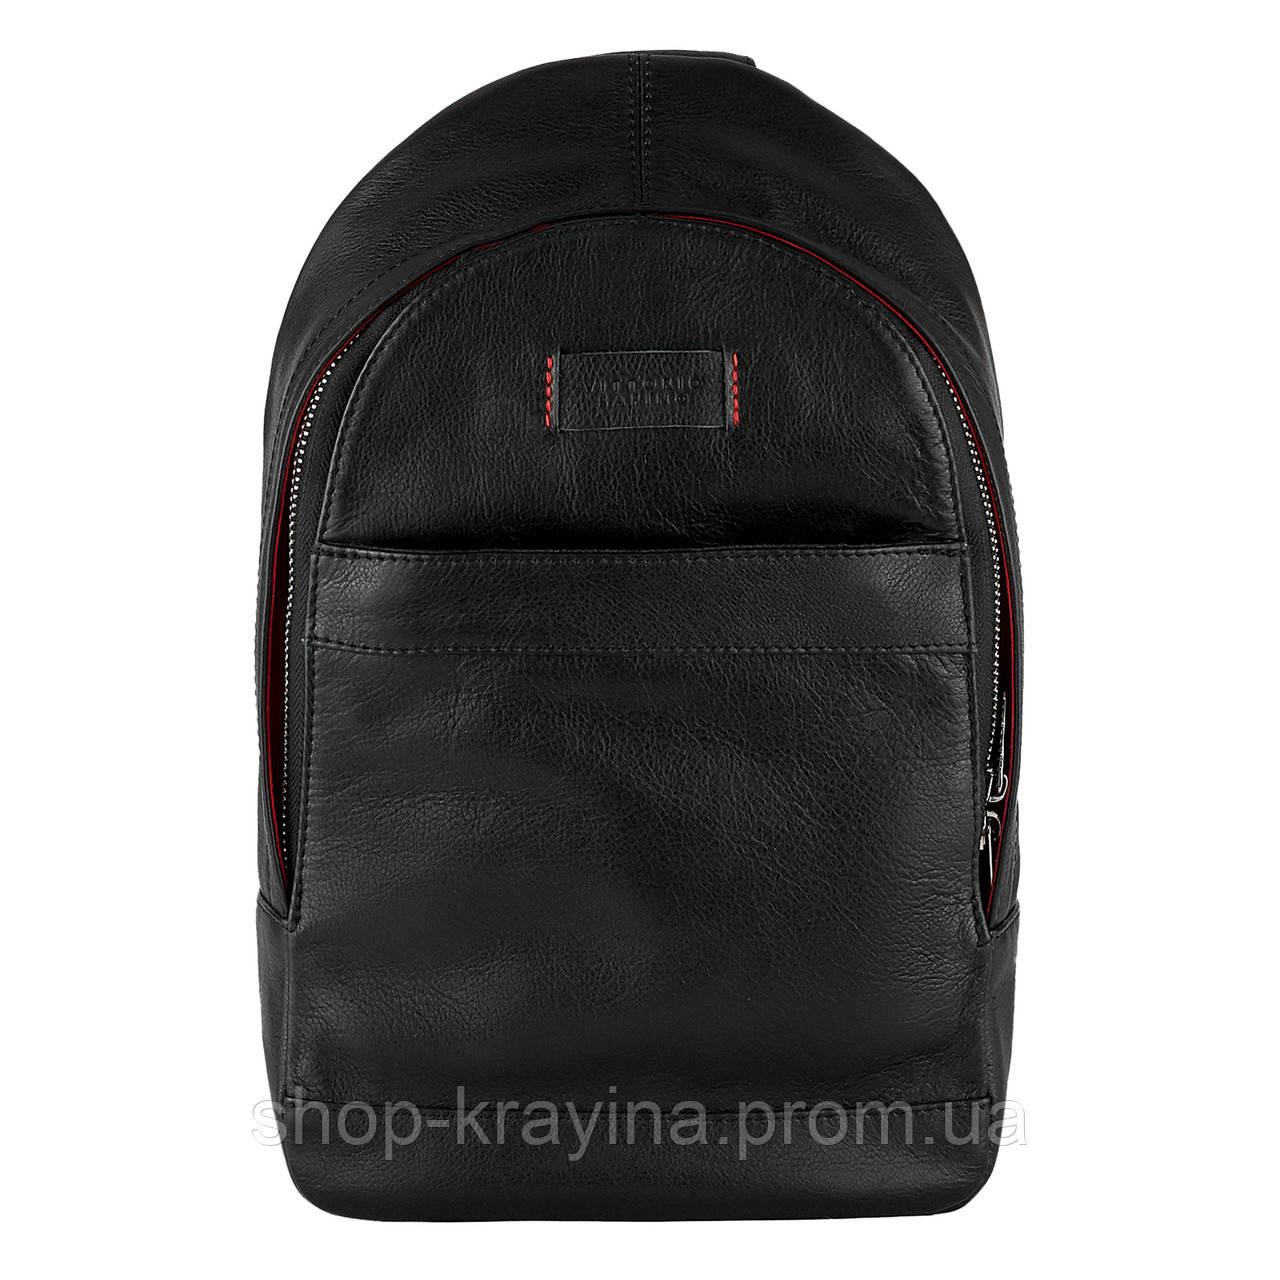 Рюкзак Cross-body из натуральной кожи Конг VS024 Унисекс black, 32х20х7